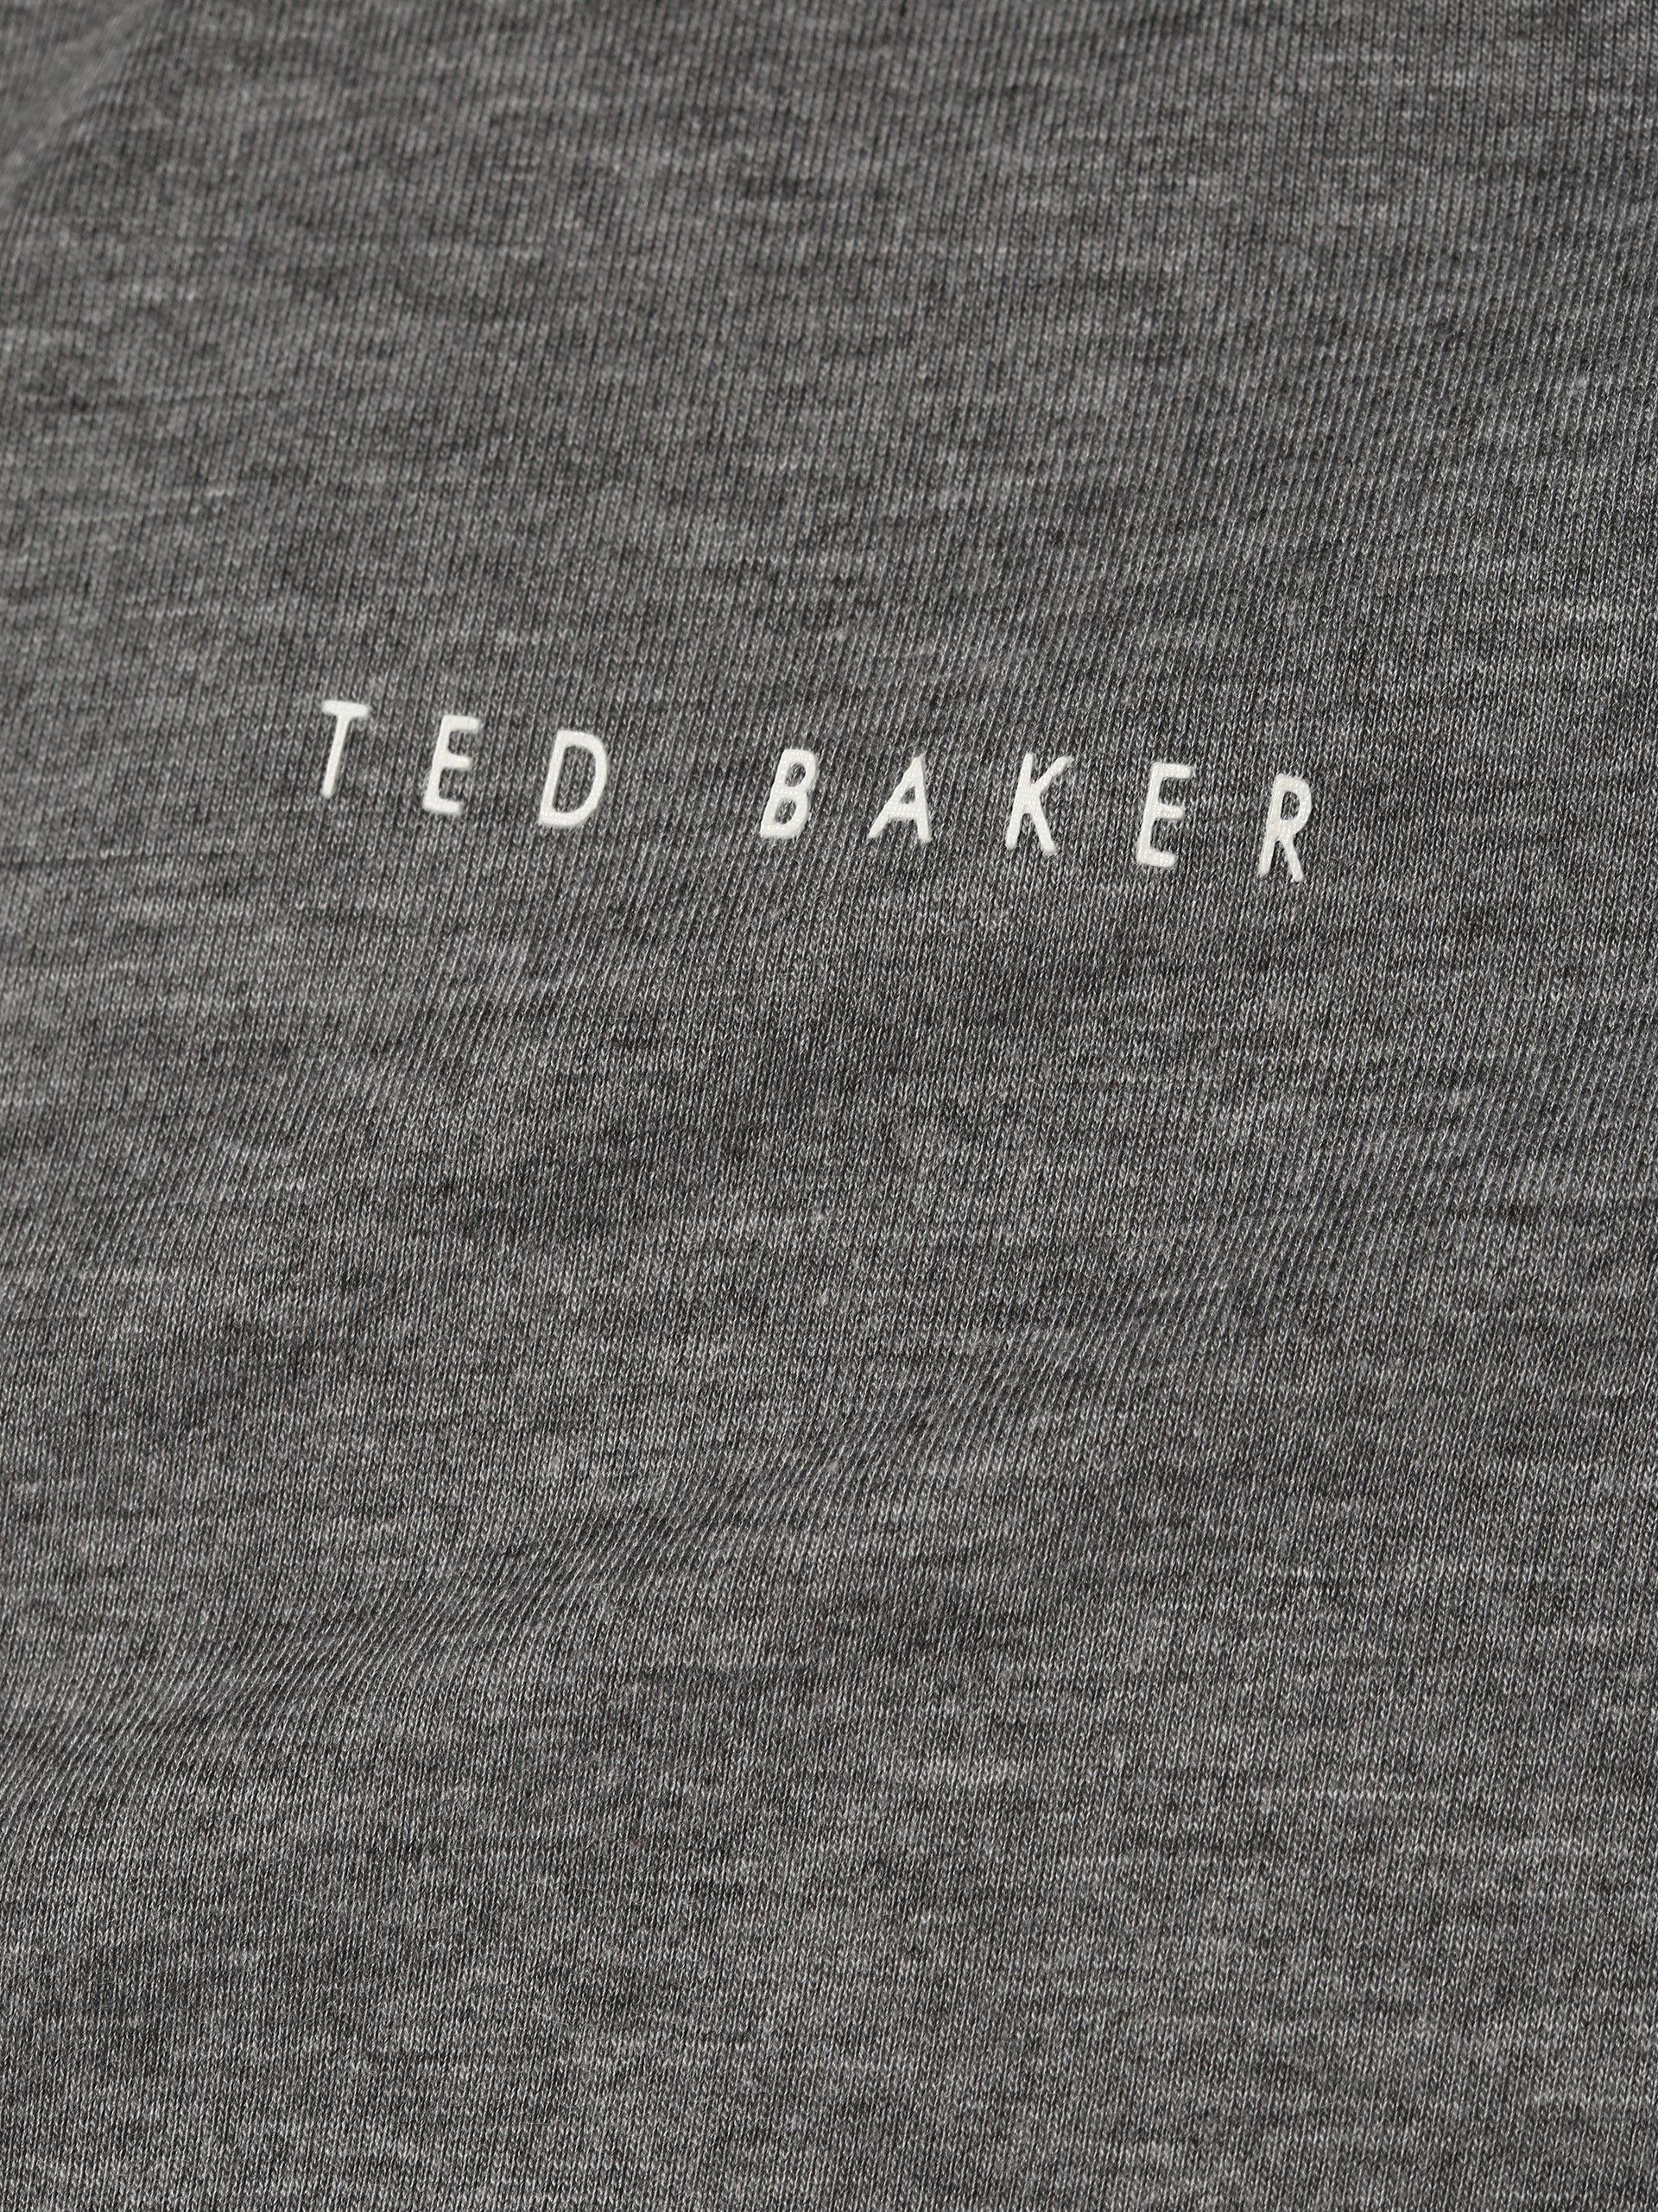 Ted Baker T-shirt męski